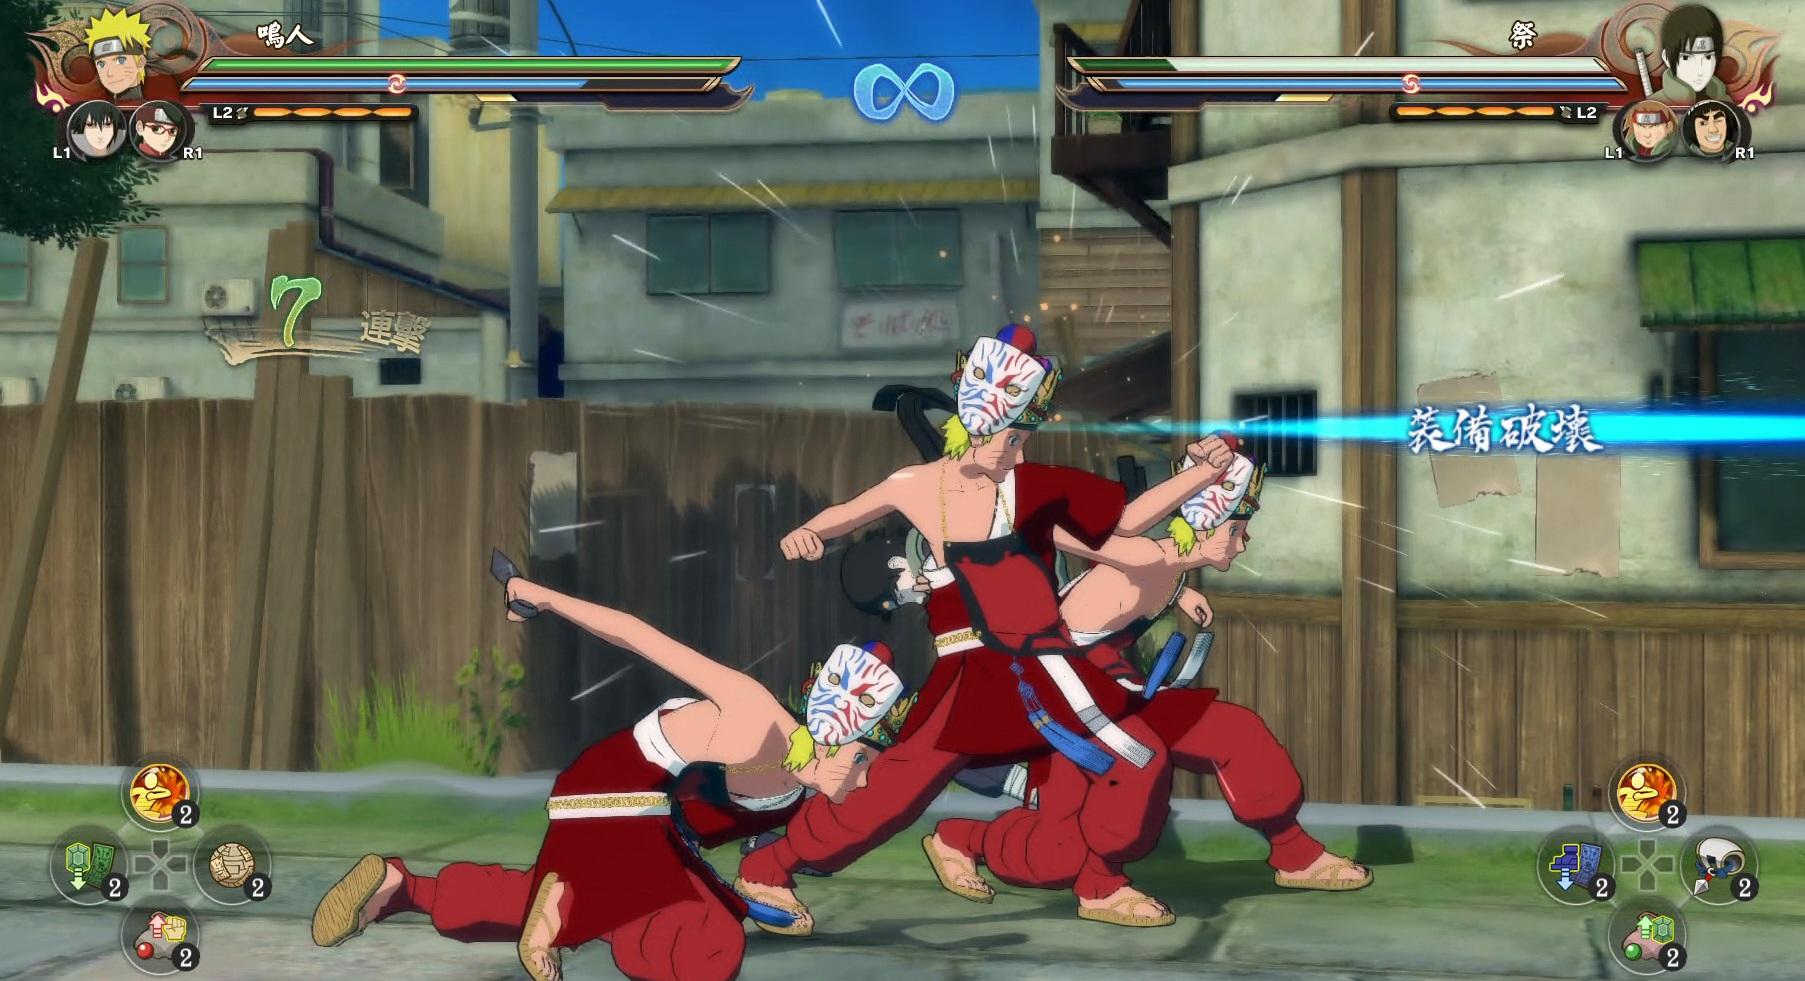 Naruto-Storm-4-traditional-2 Naruto Storm 4: Geleneksel Çin Kostümü DLC'si Duyuruldu